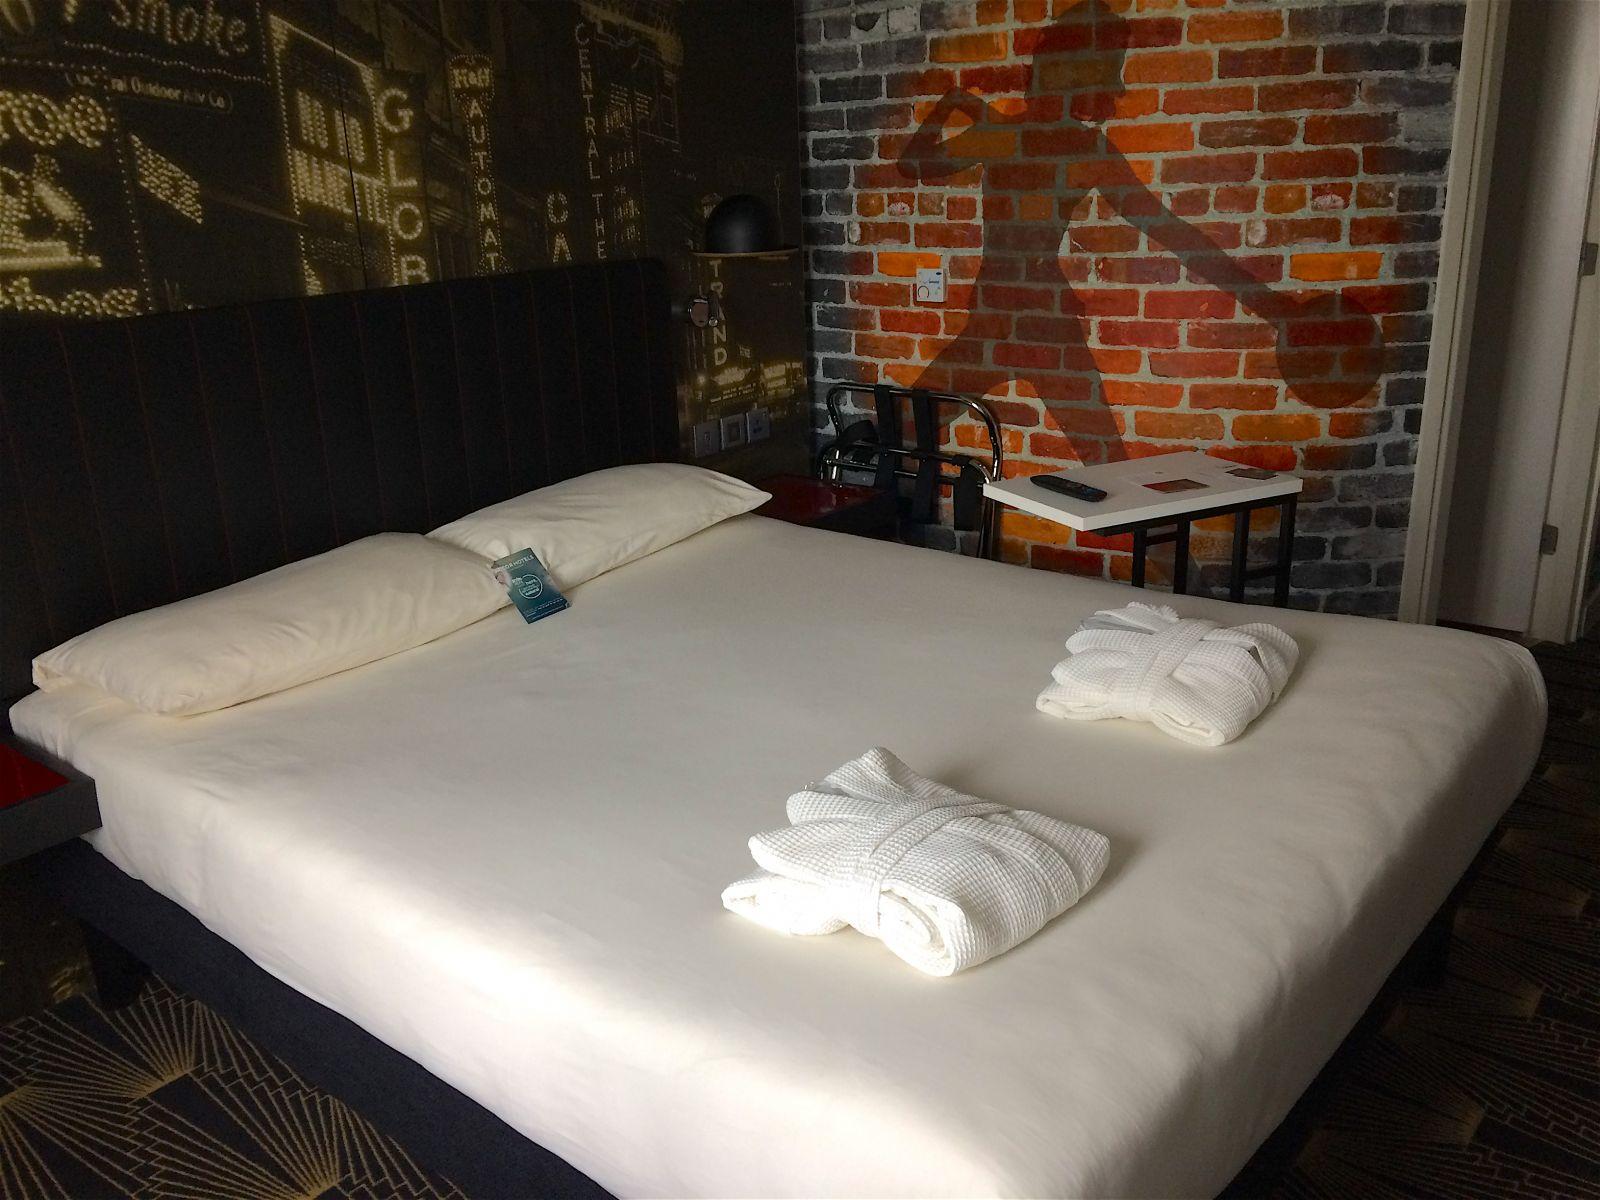 ibis-styles-southwark-hotel-bedroom-london